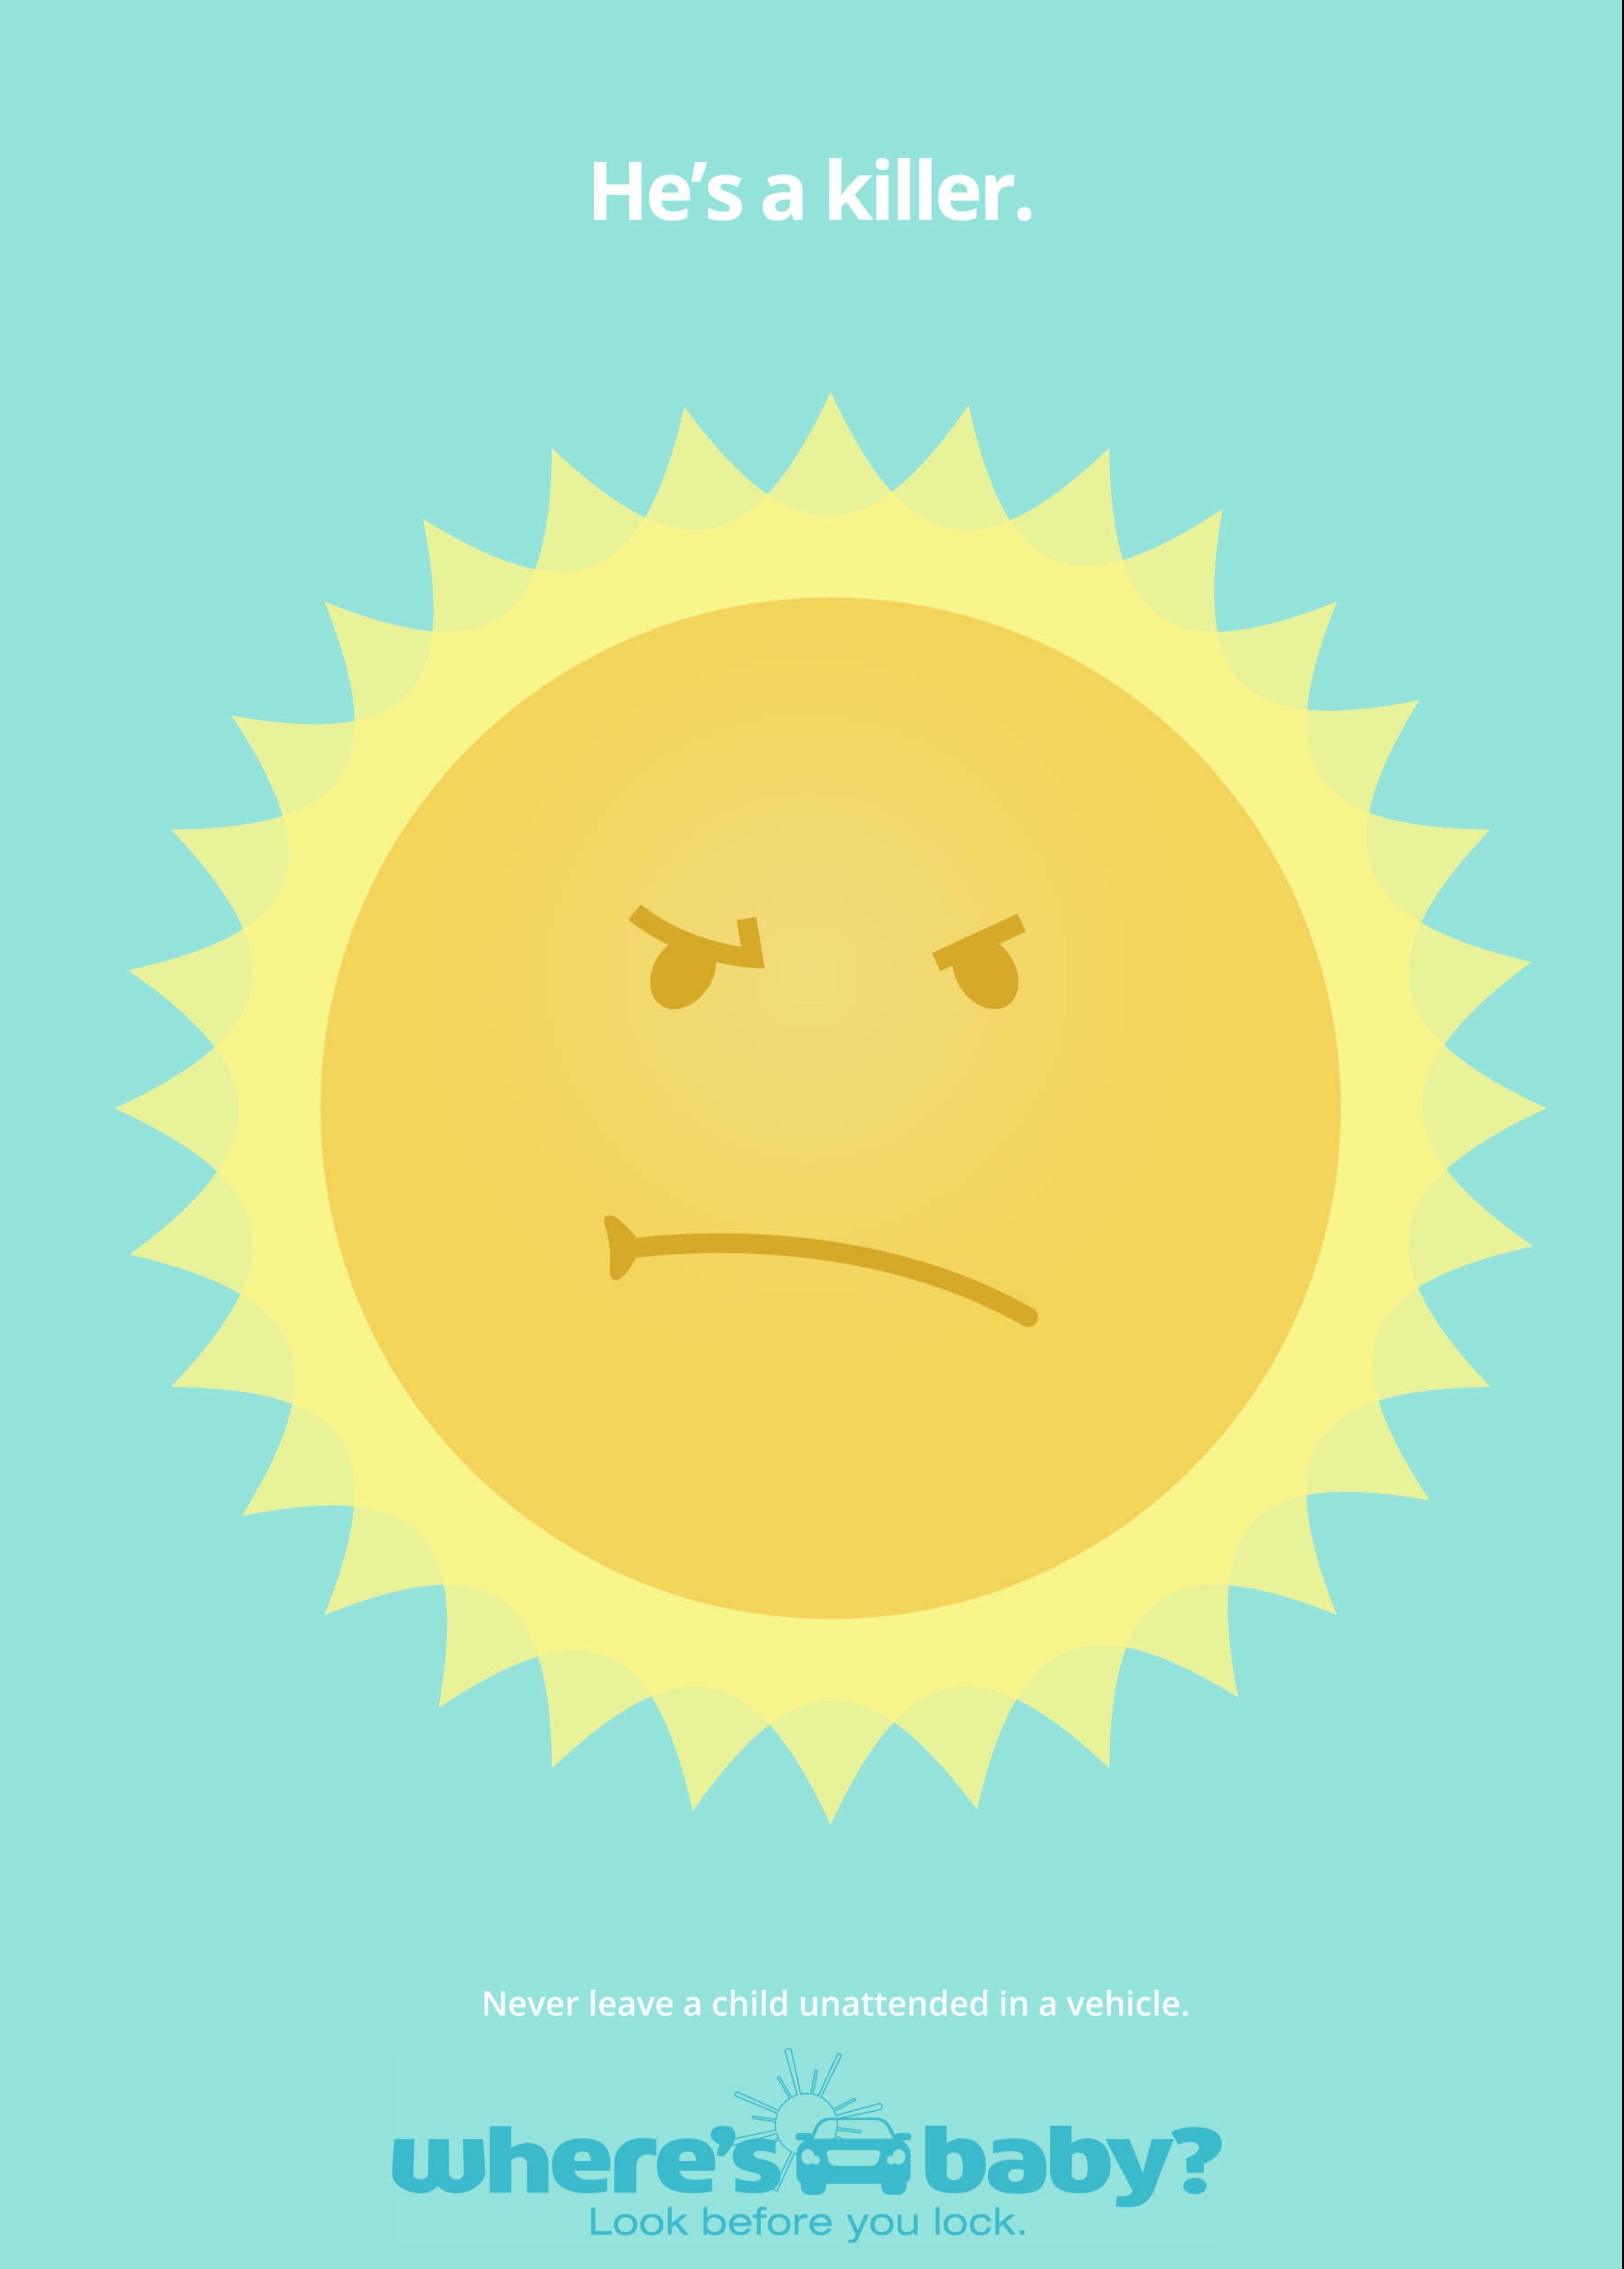 heatstroke NHTSA sun stroke heat pediatric trauma where's baby